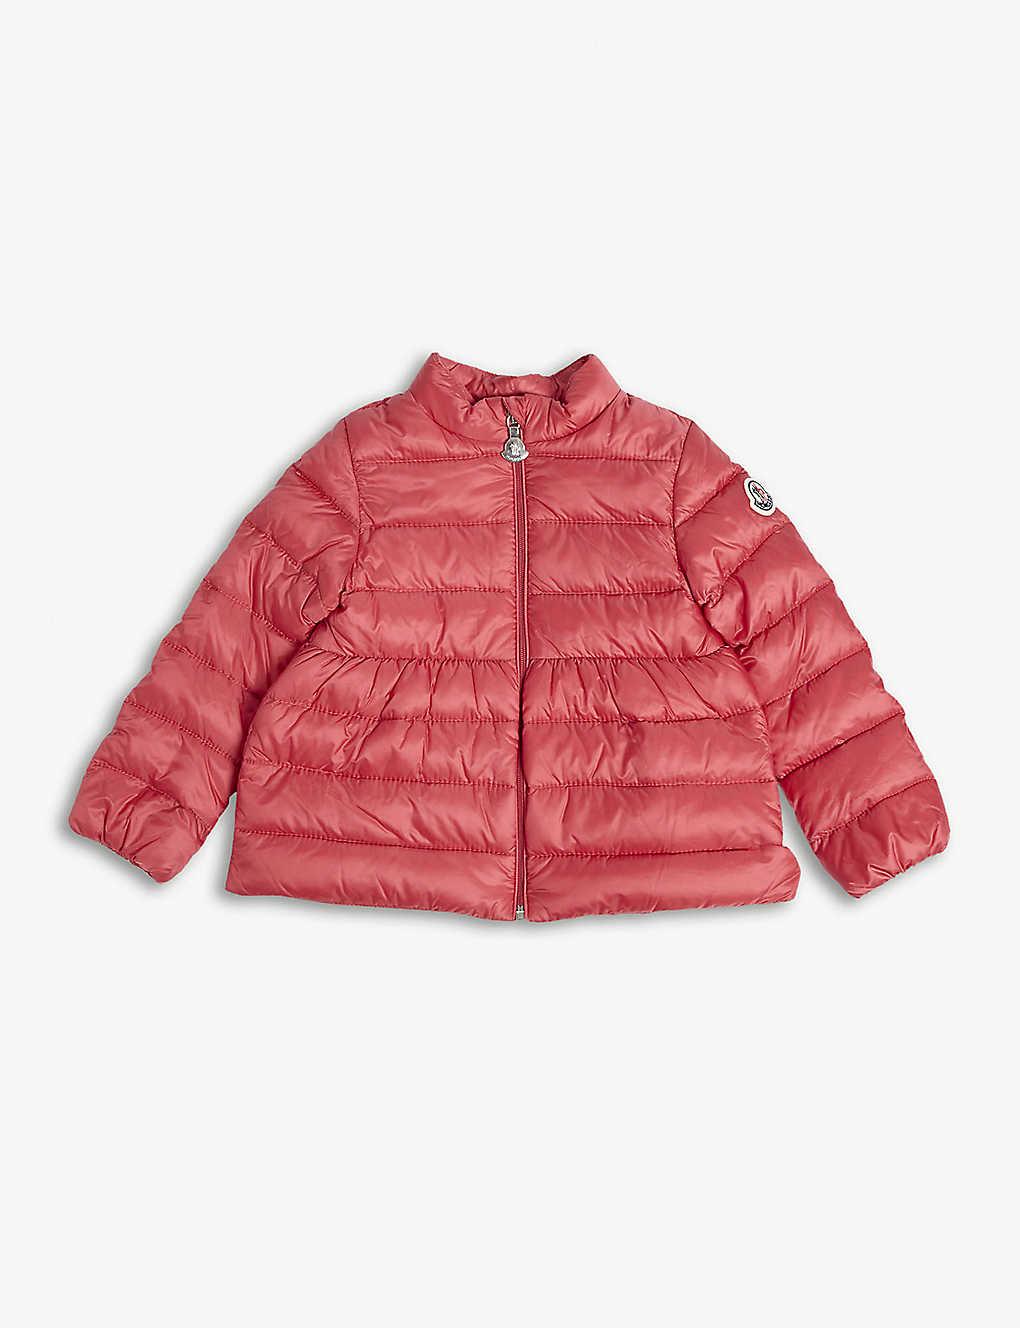 845d1195c Joelle flare puffa jacket 6-24 months